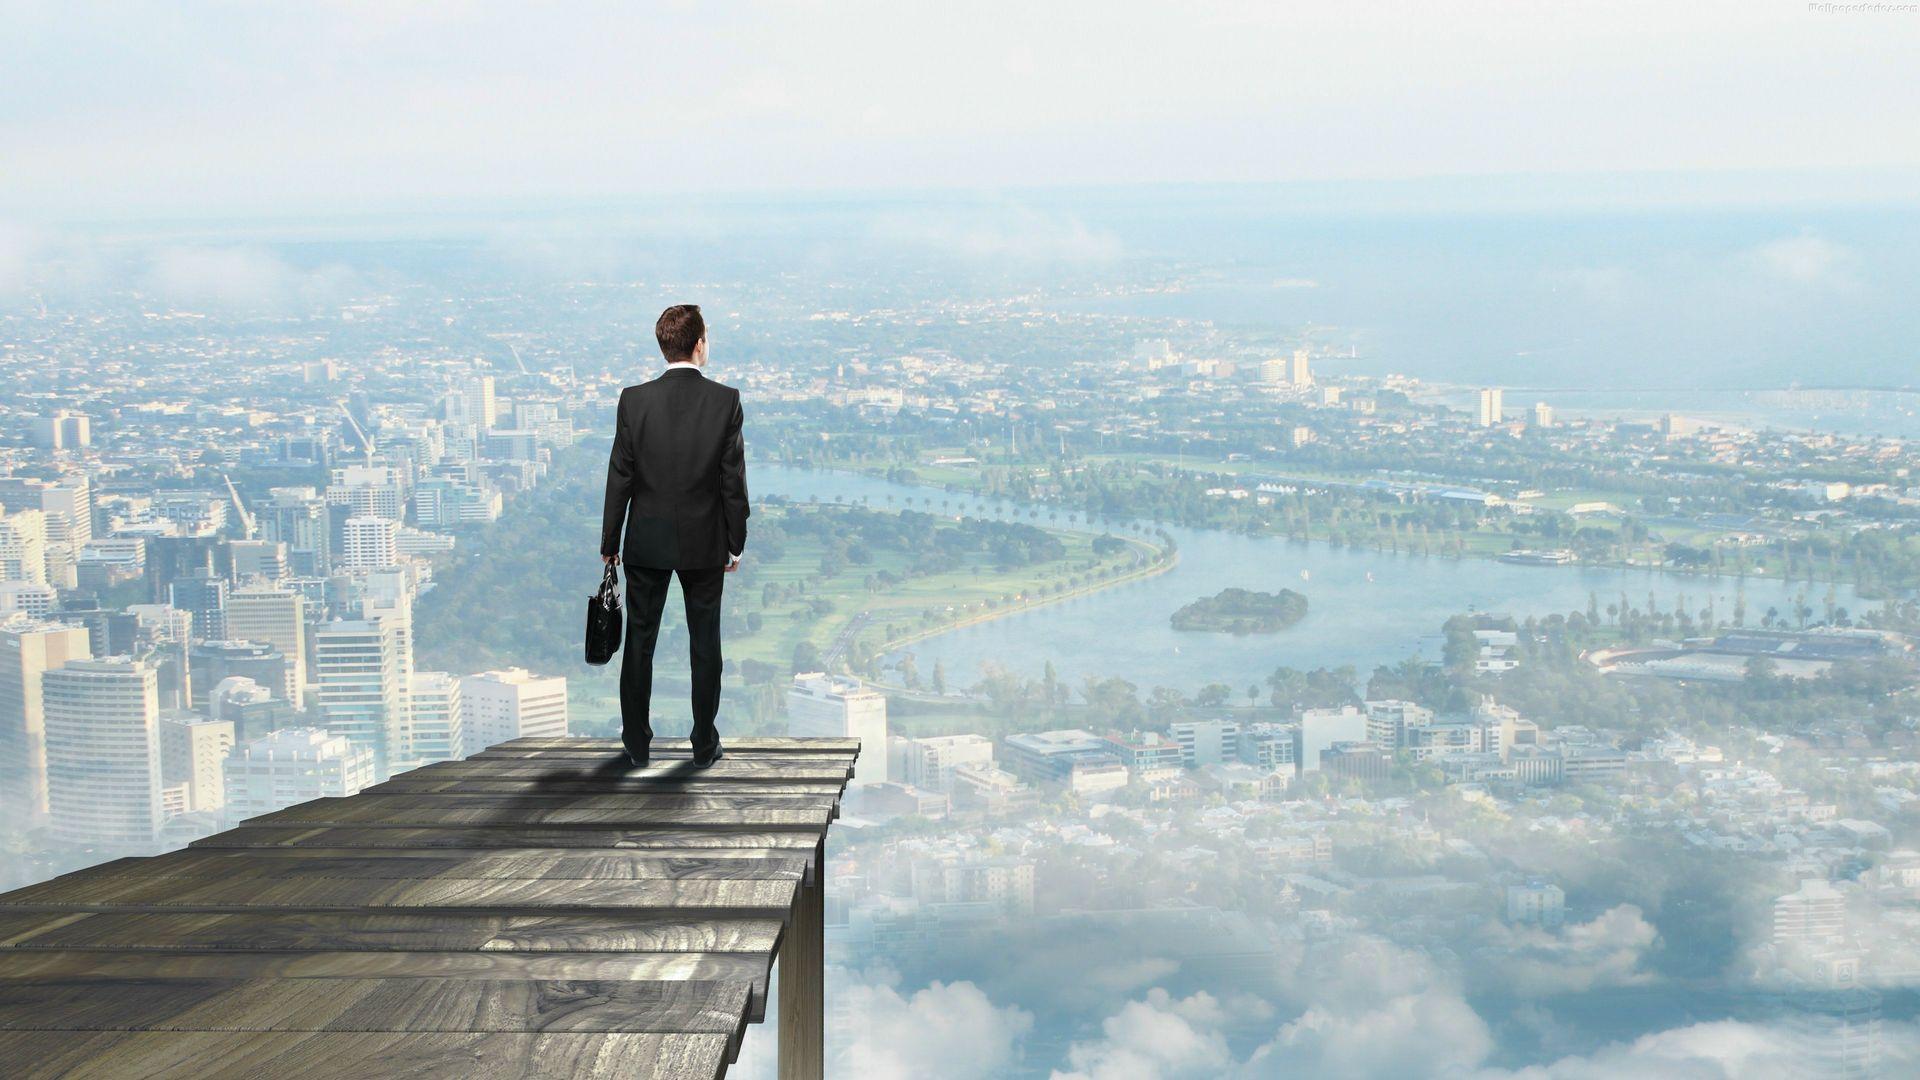 businessman-in-heights-wallpaper-business-man